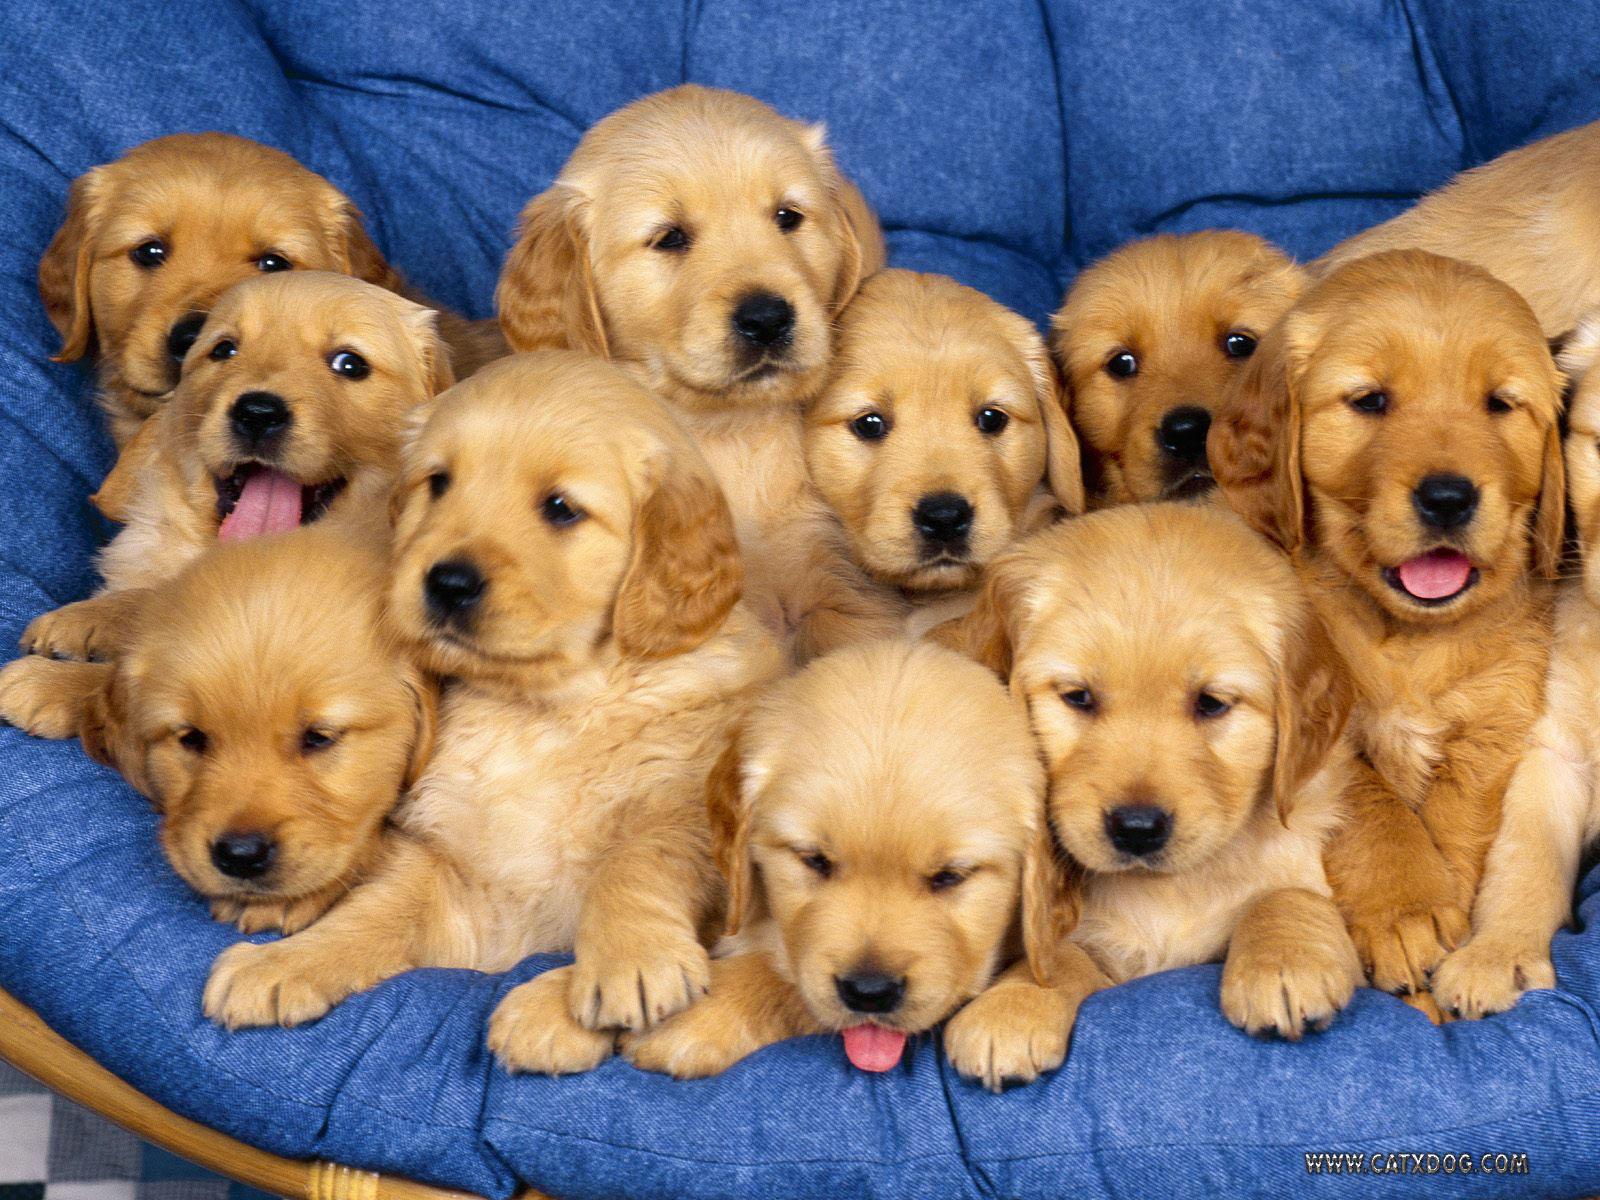 http://1.bp.blogspot.com/_RbYw_S1-bvE/TNoVkhHb0kI/AAAAAAAAAD4/0LiguDdtG-U/s1600/golden-retriever-puppies.jpg